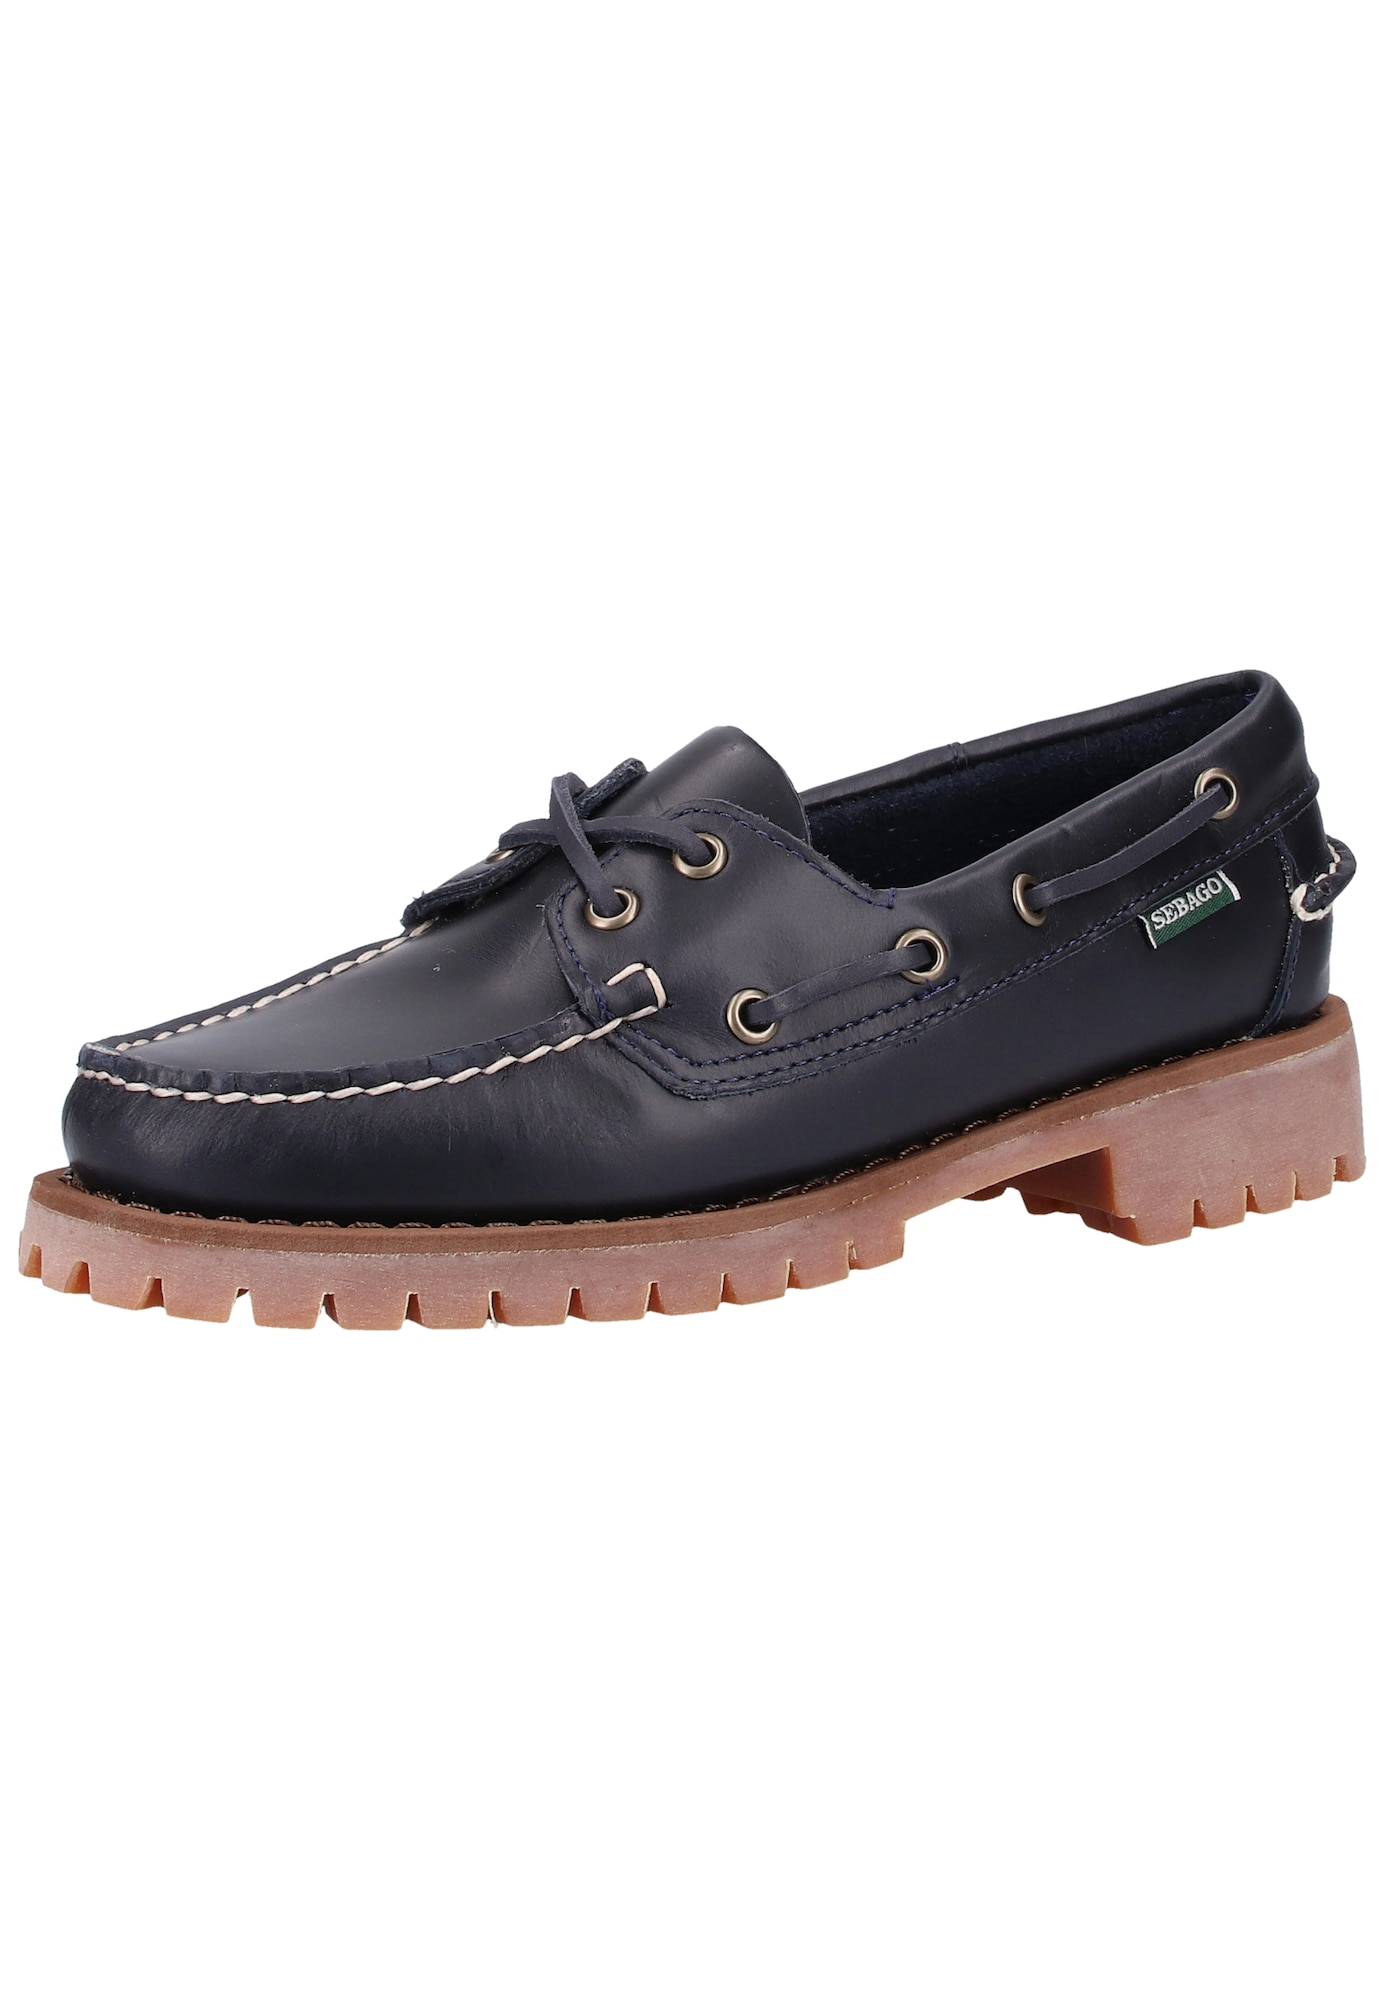 Halbschuhe | Schuhe > Boots > Schnürboots | Sebago